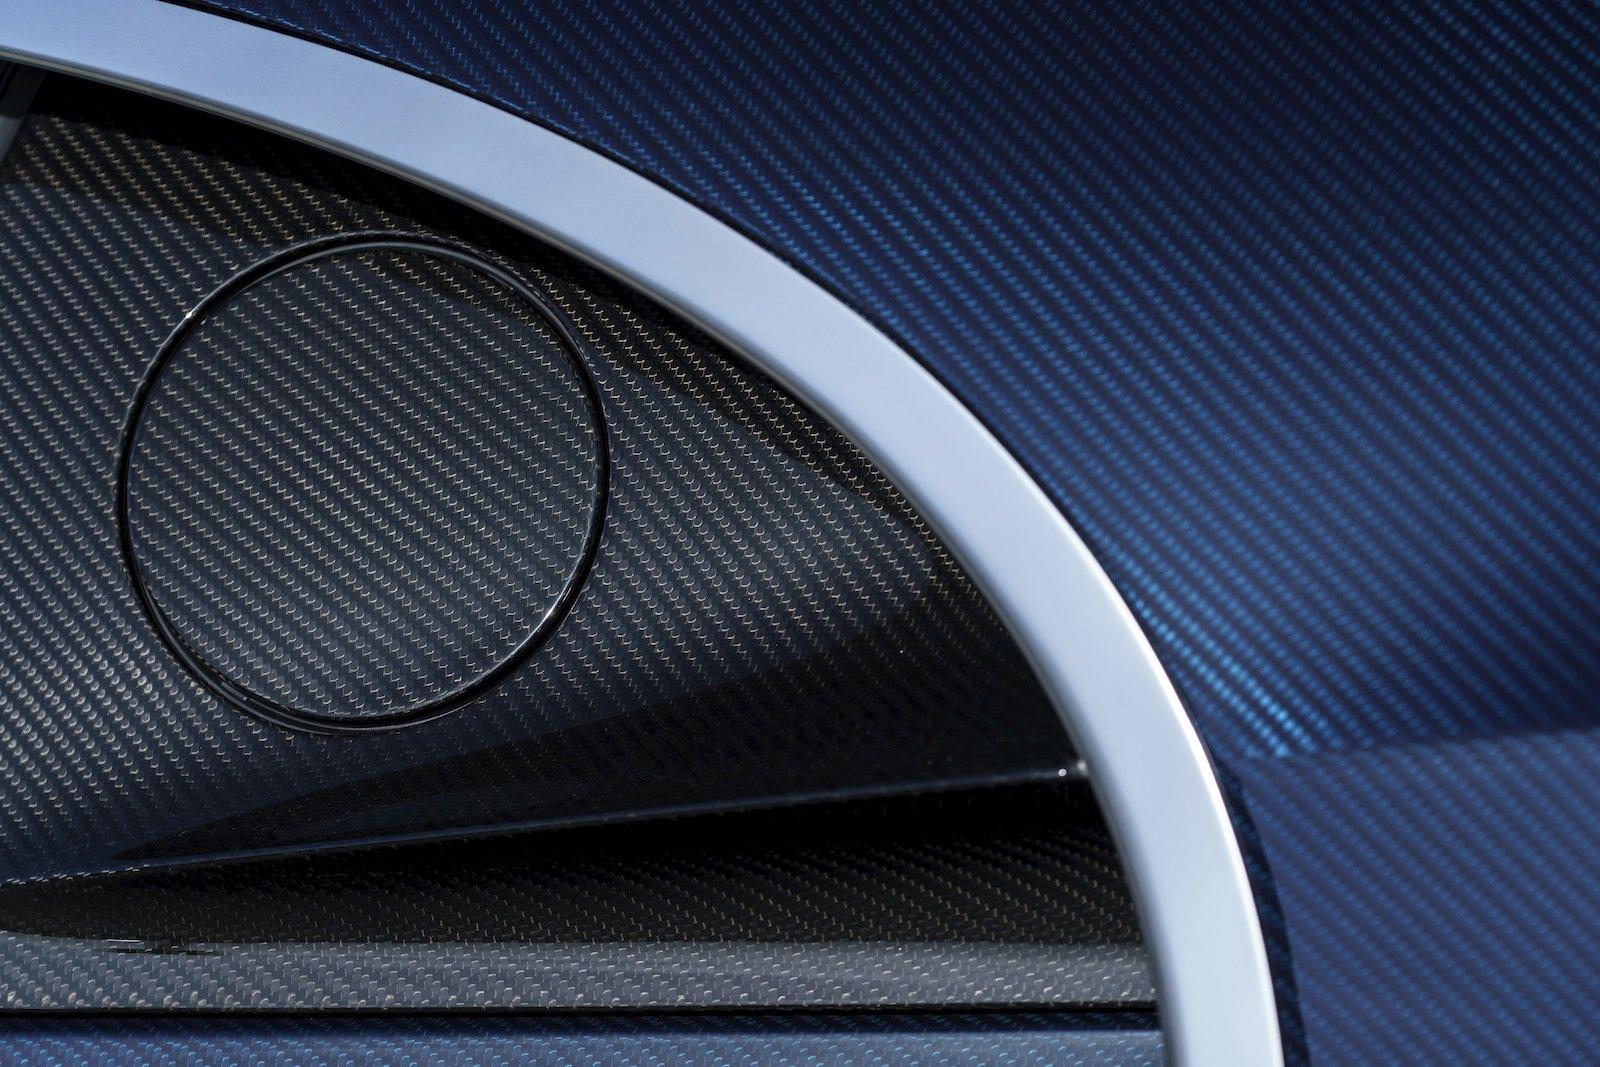 13_Bugatti_Chiron_The_Quail